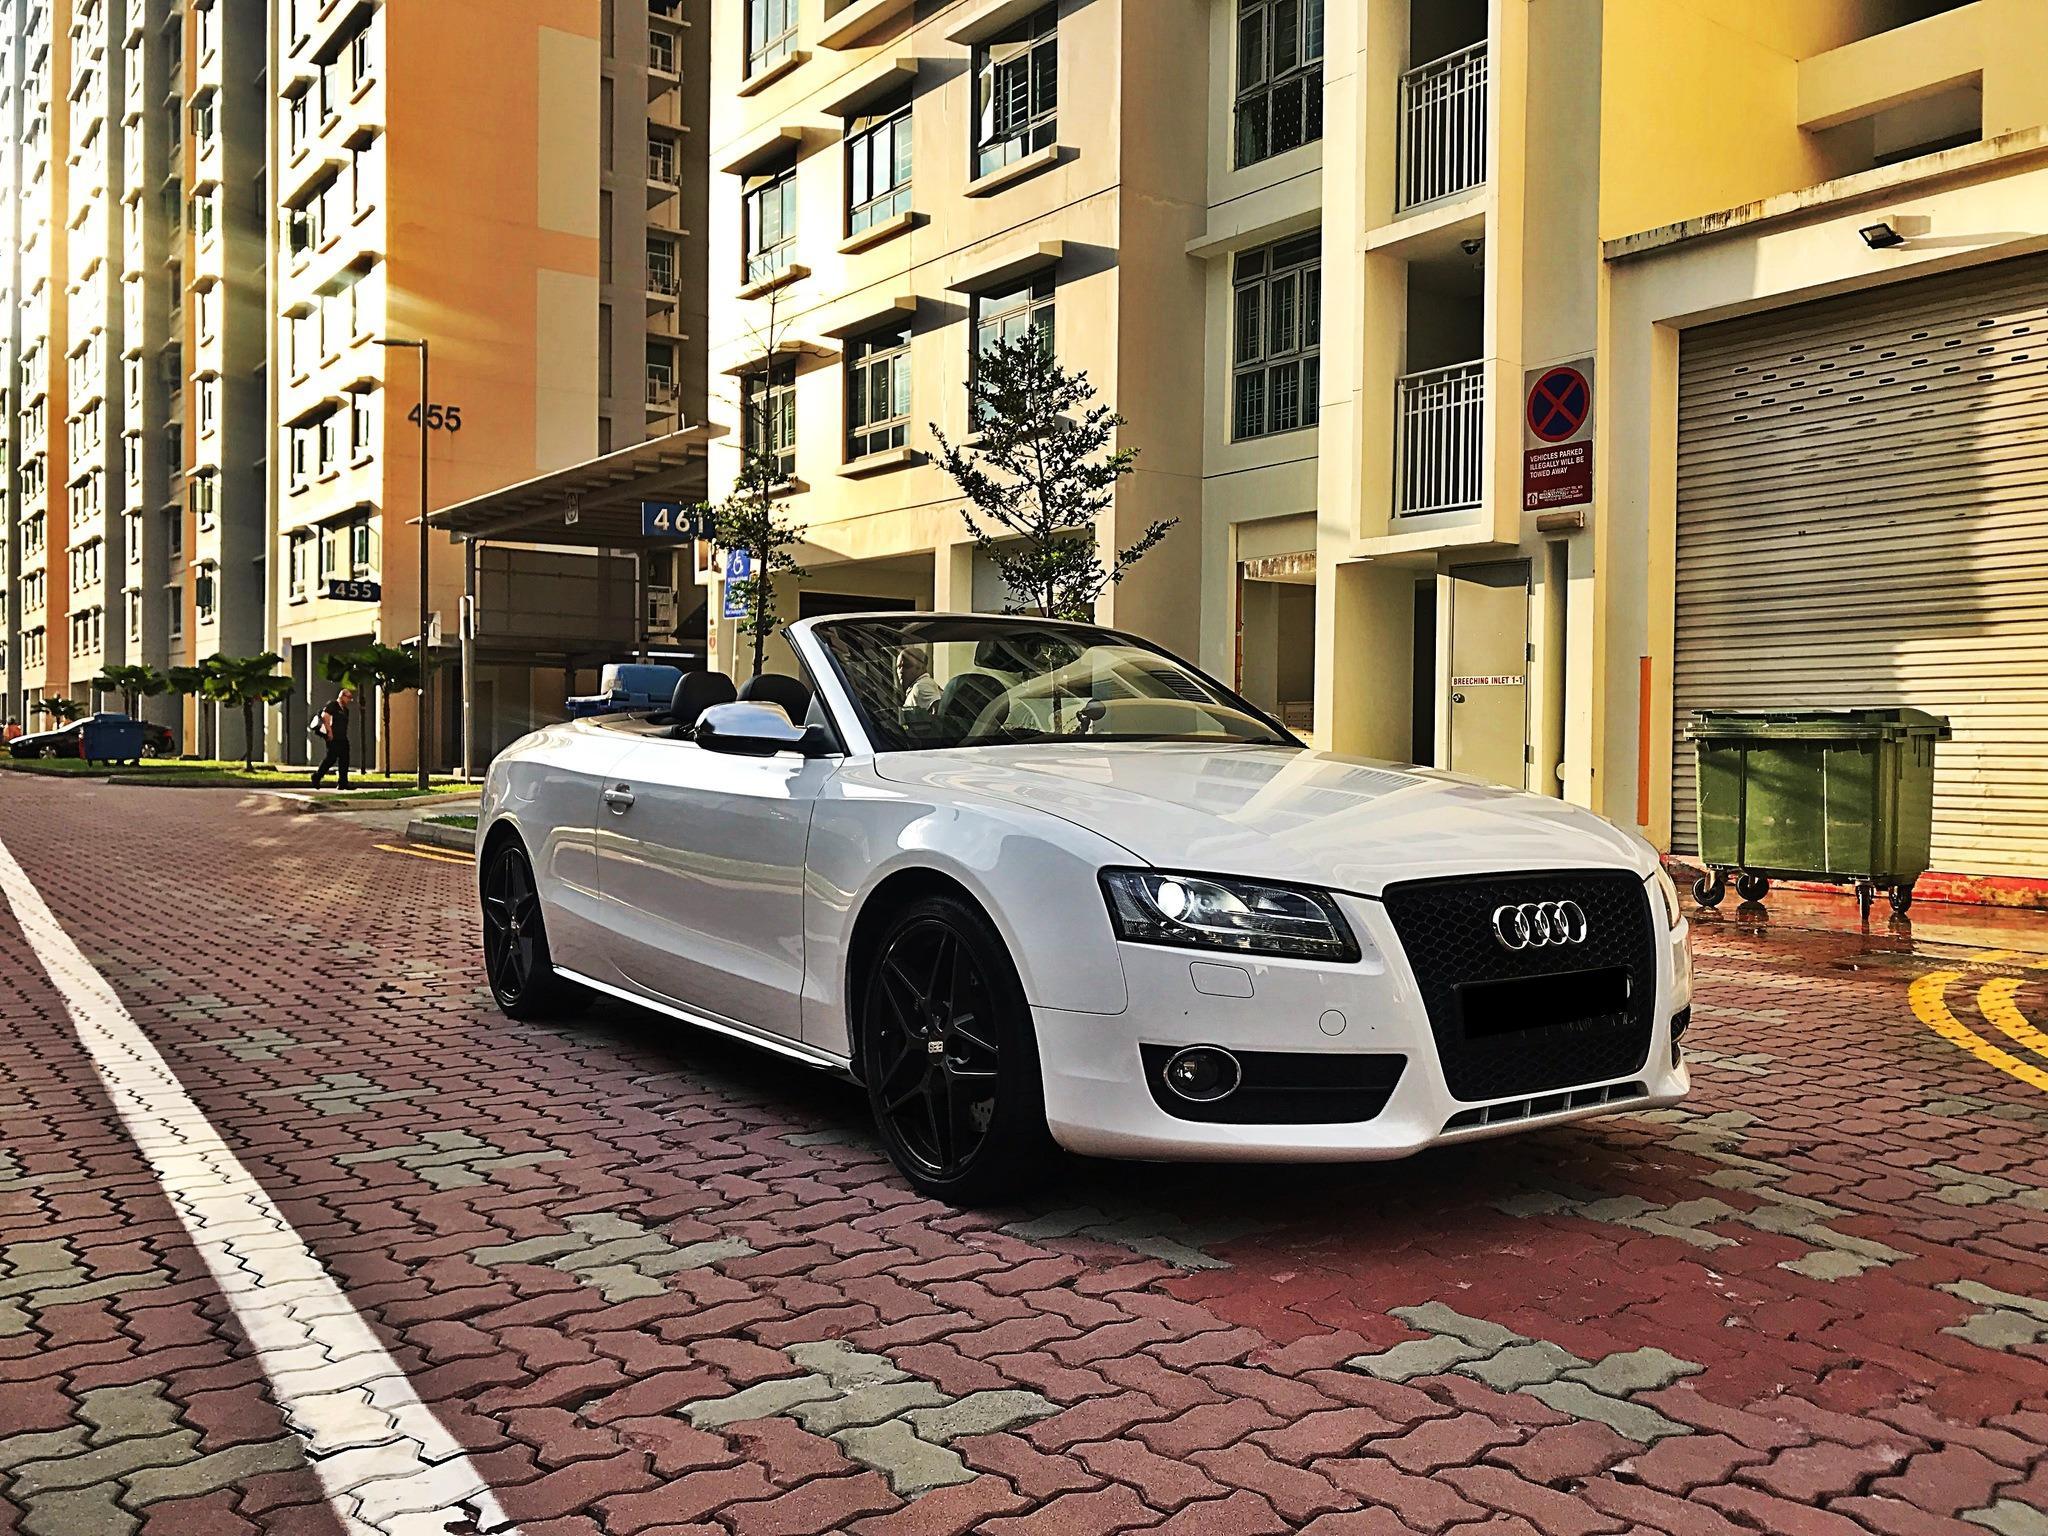 Audi A5 Cabriolet 2.0 TFSI quattro S tronic Auto